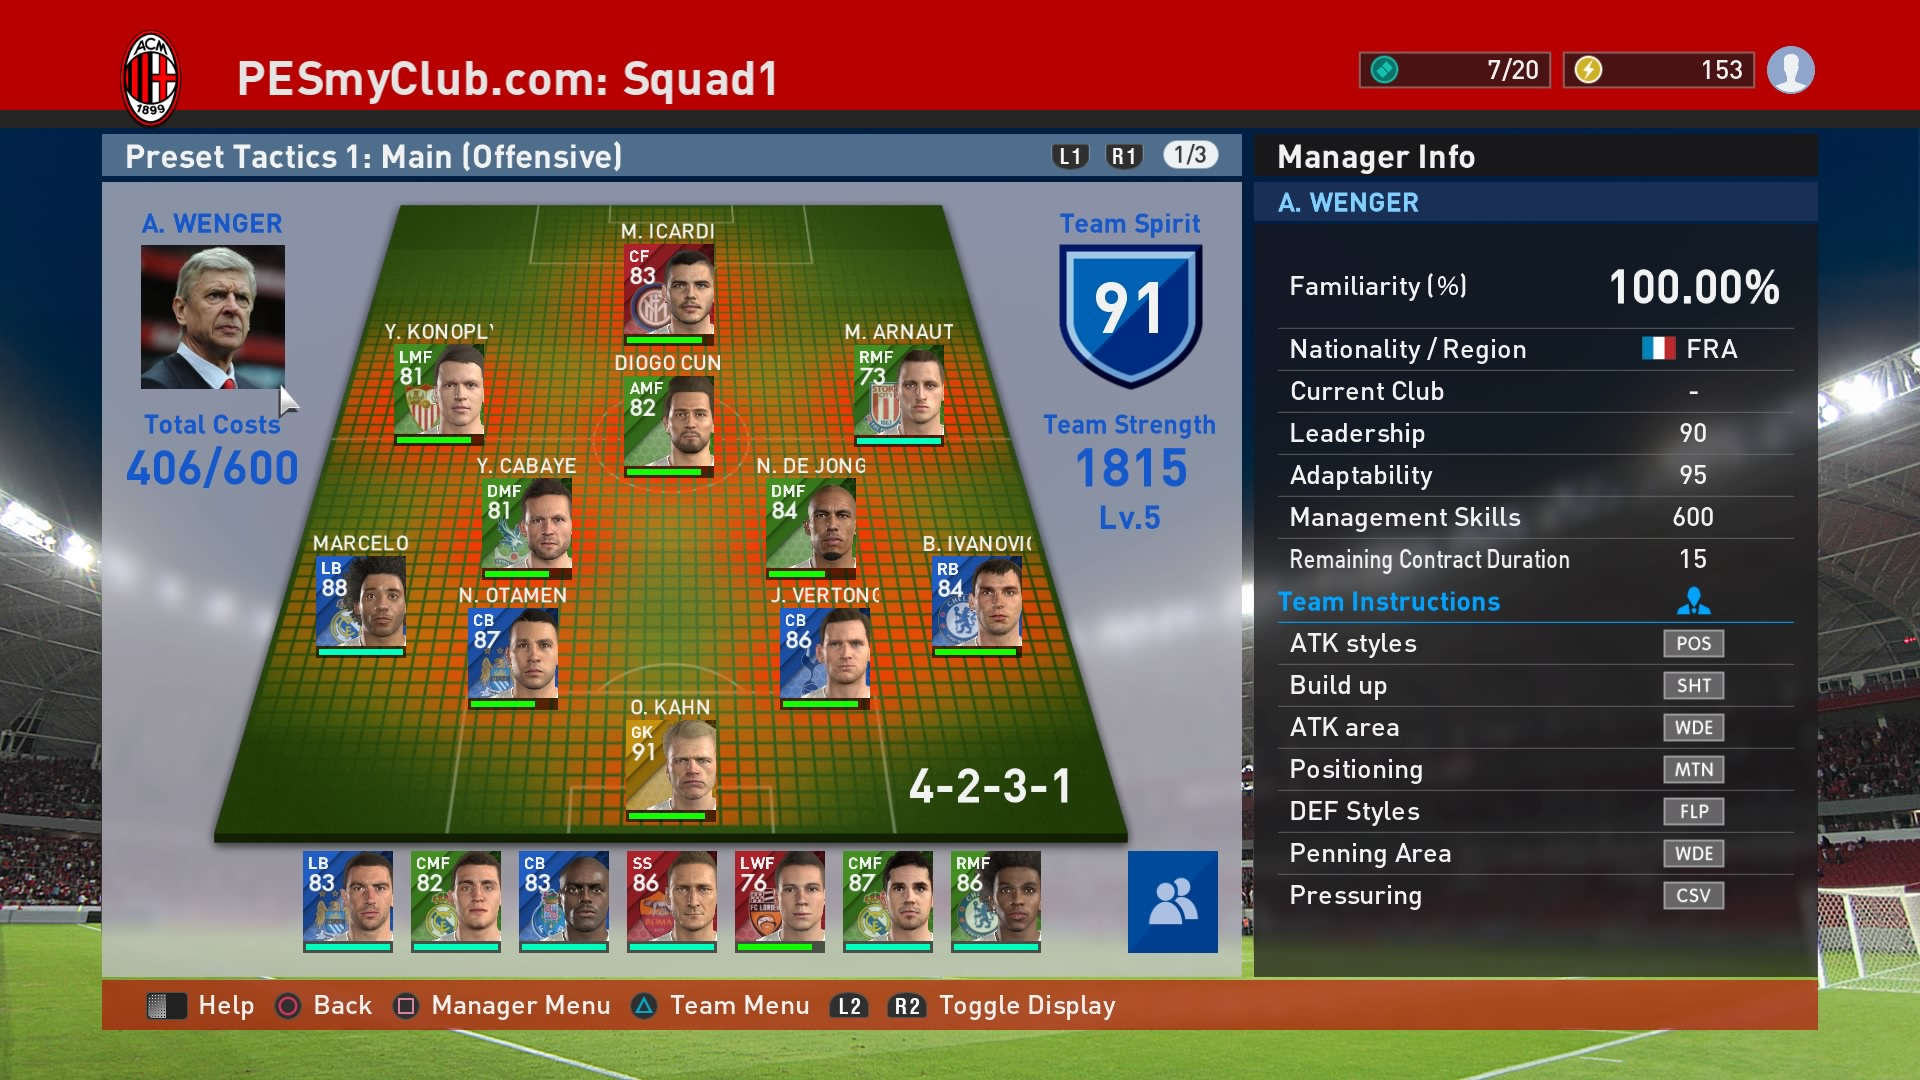 PES 2017 myClub - Team Spirit